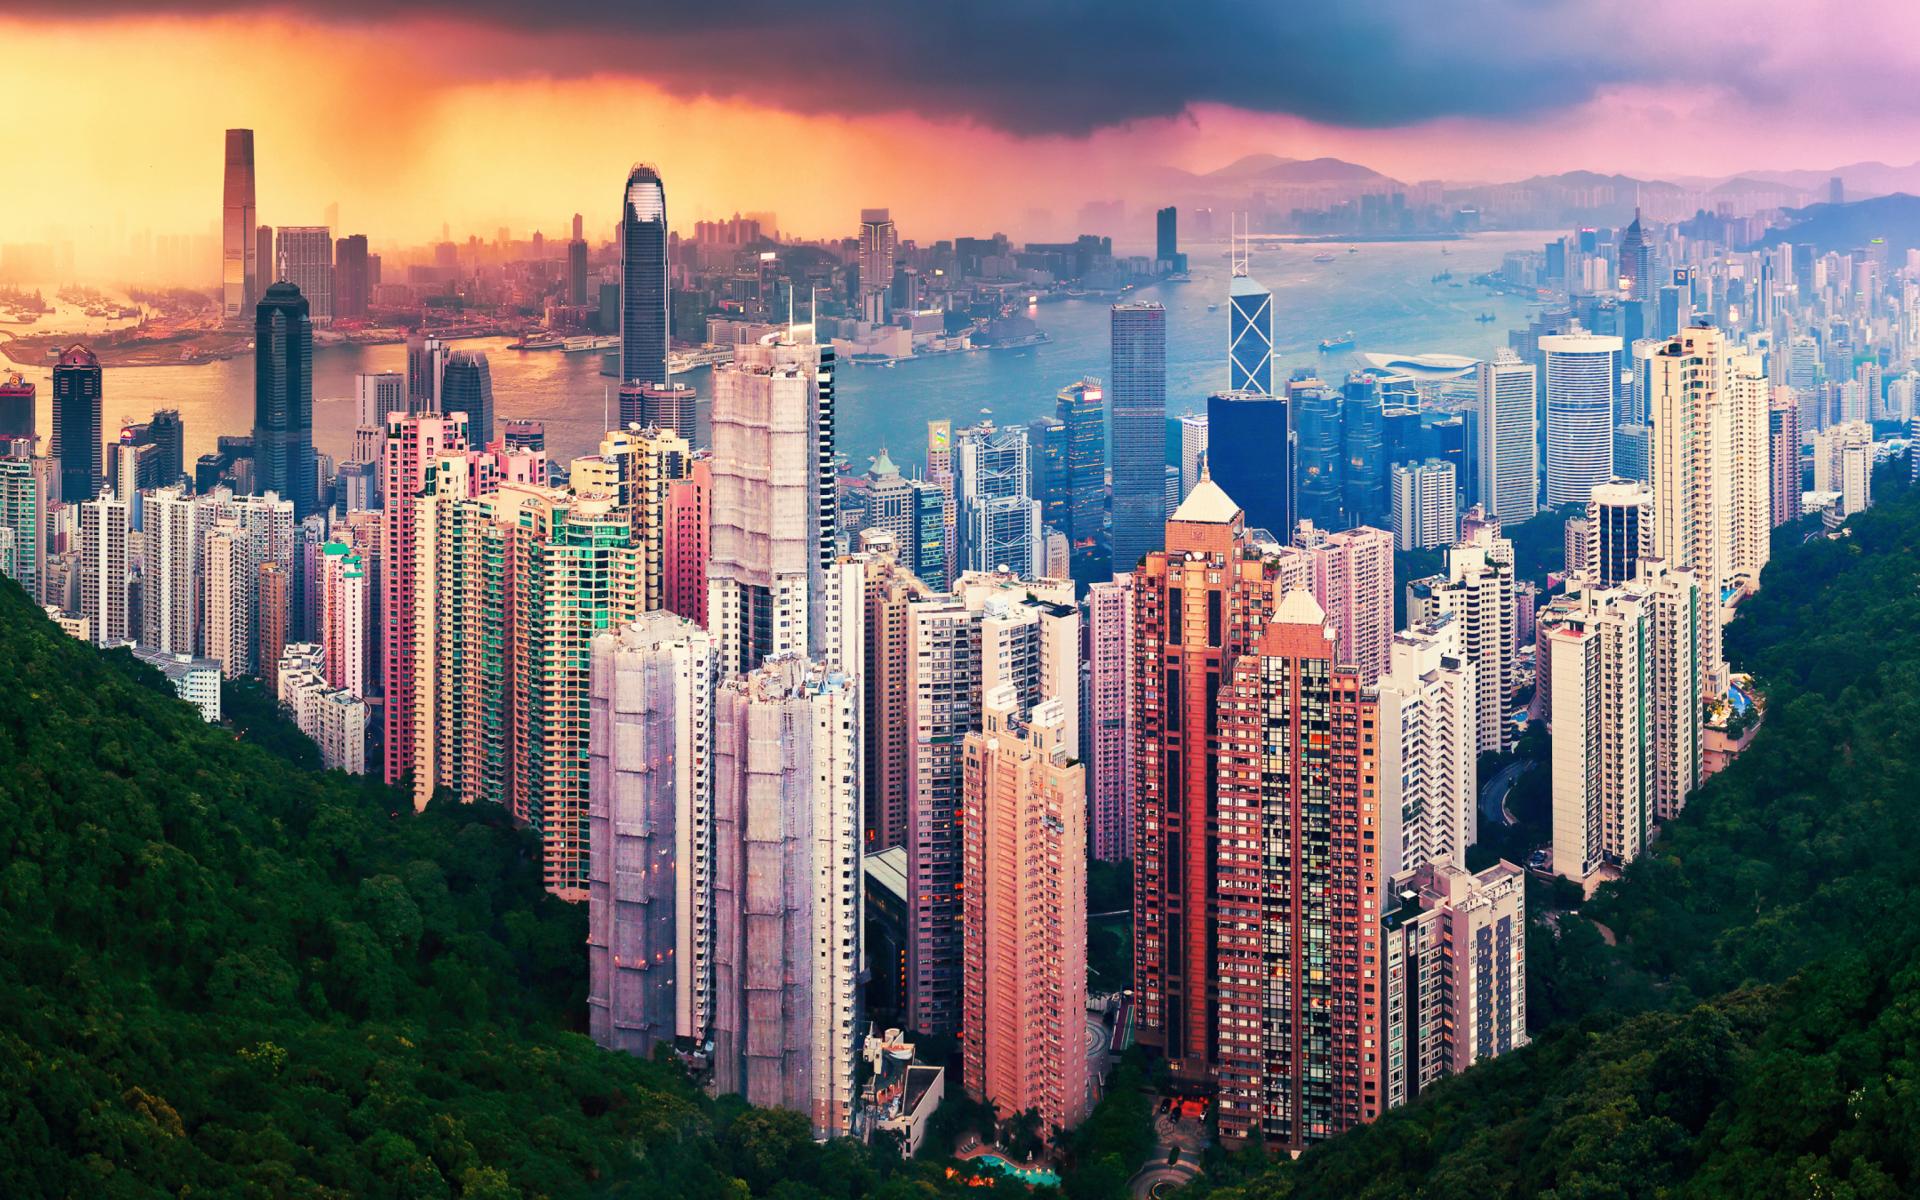 Hong Kong para Widescreen Desktop PC 1920x1080 Full HD